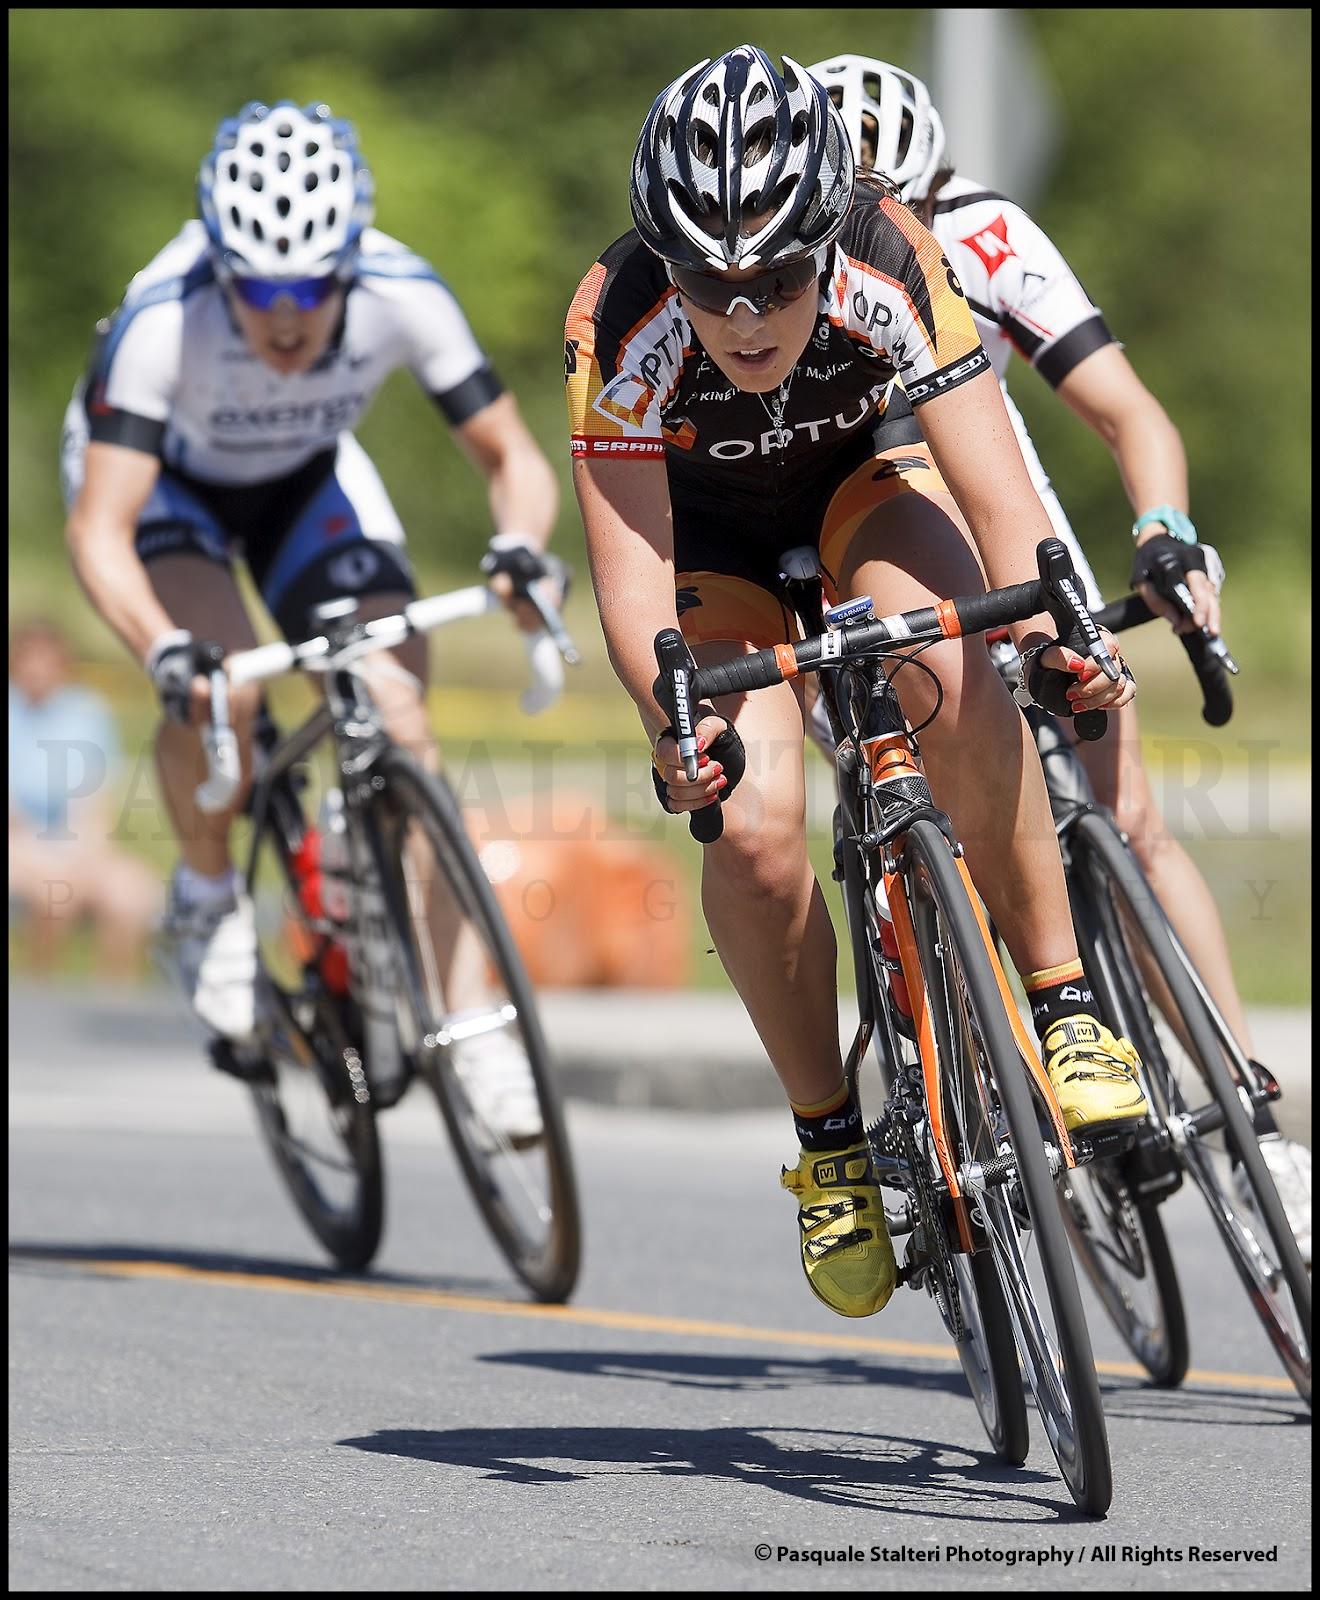 National crit championship results miroir du cyclisme for Miroir du cyclisme